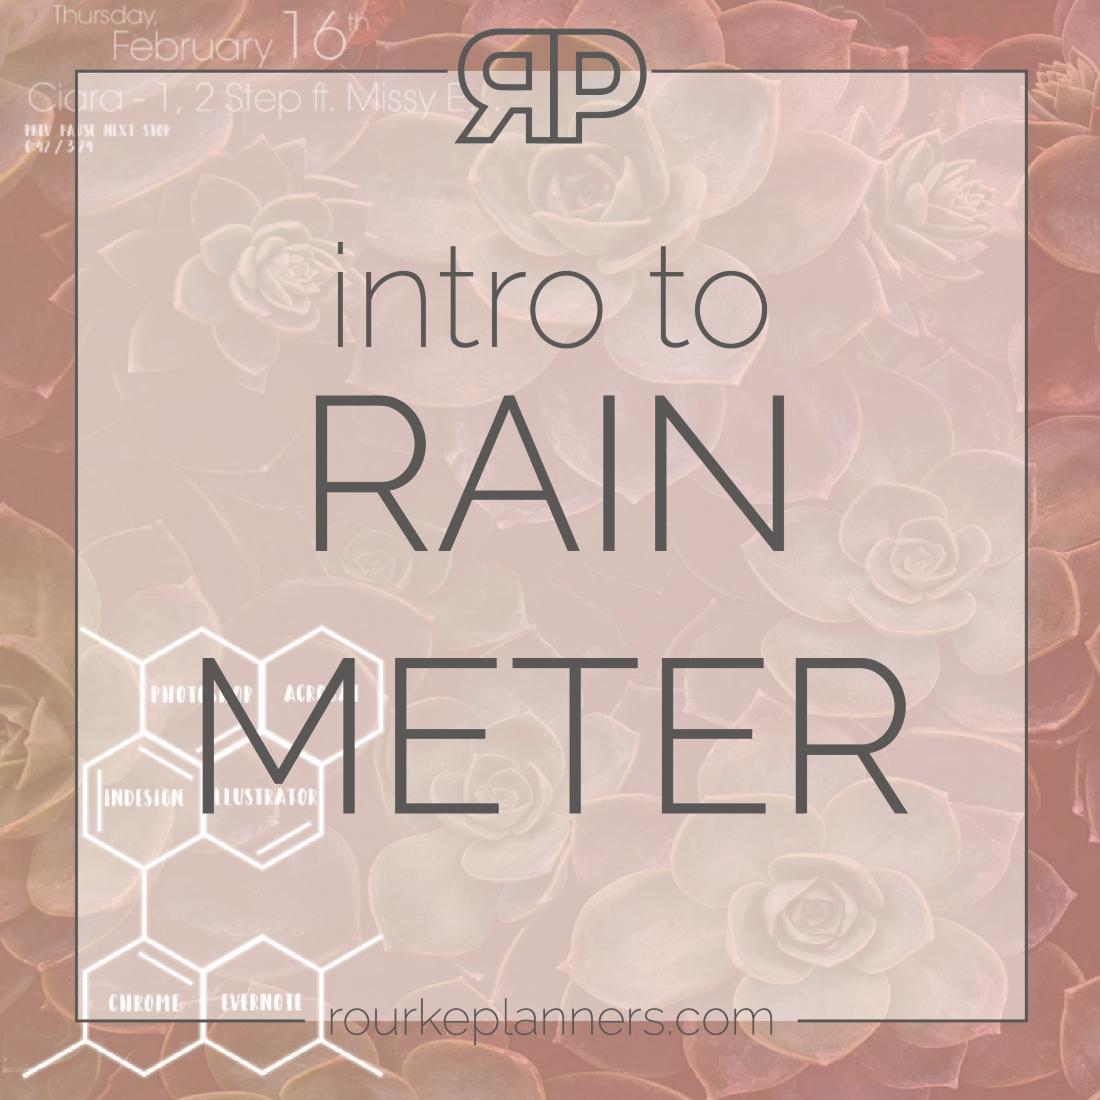 Intro to Rainmeter | Rourke Planners